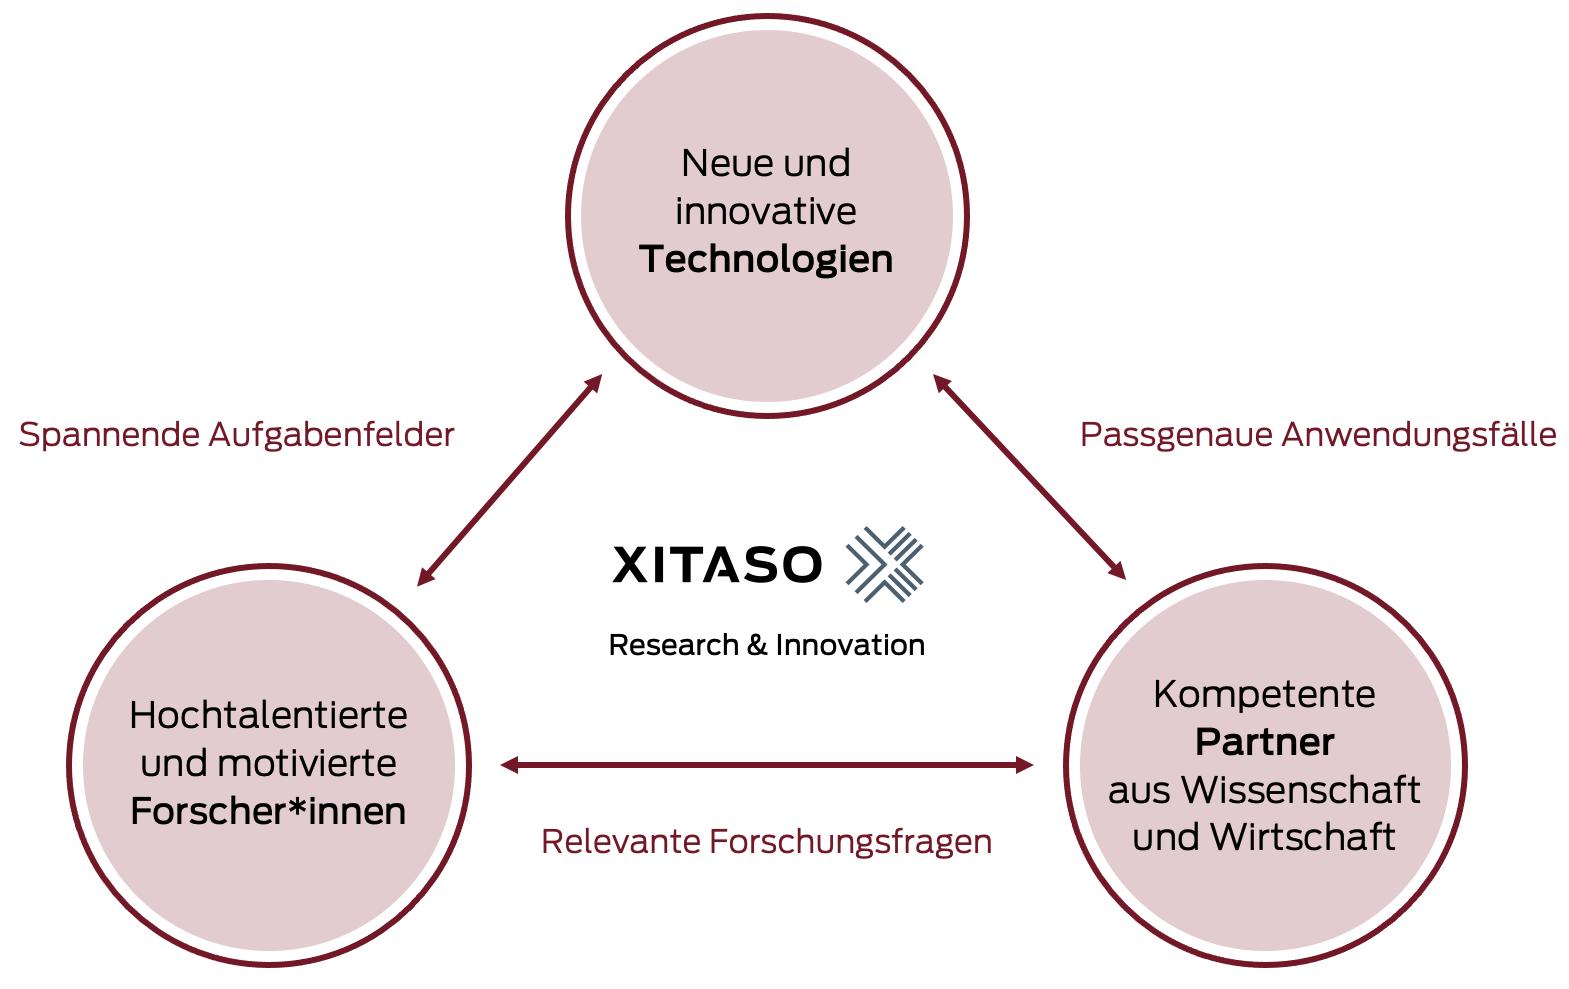 XITASO Research und Innovation